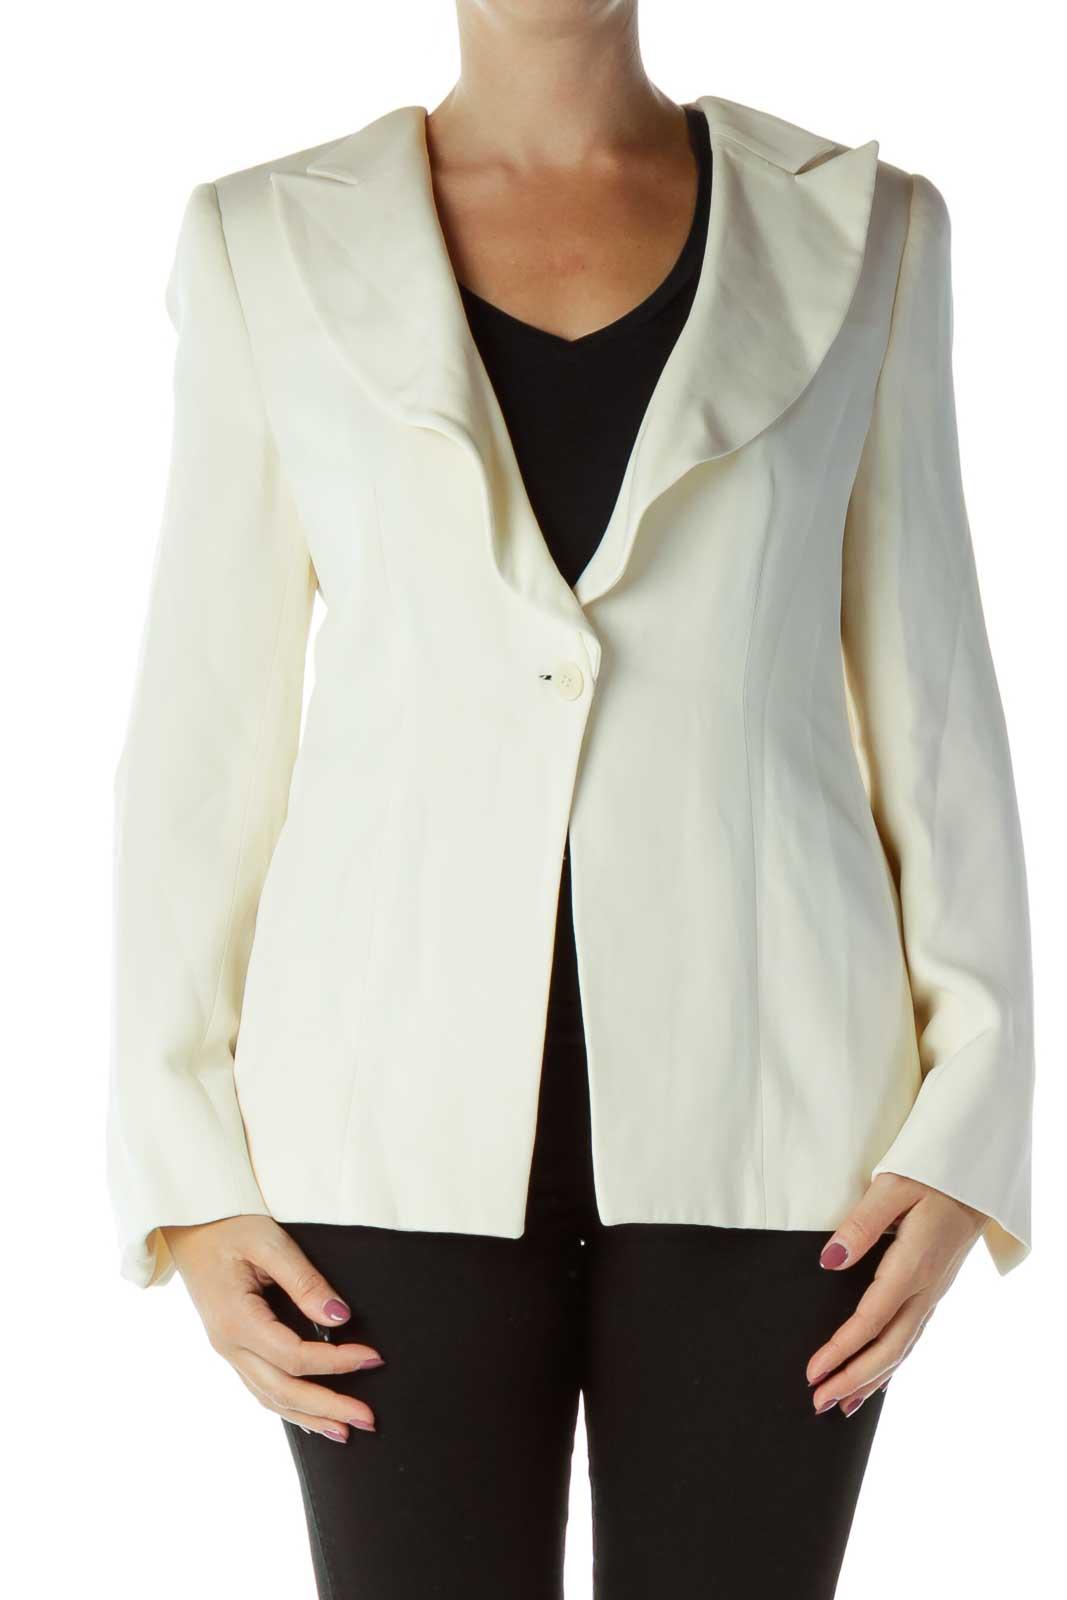 Cream Buttoned Suit Jacket Front